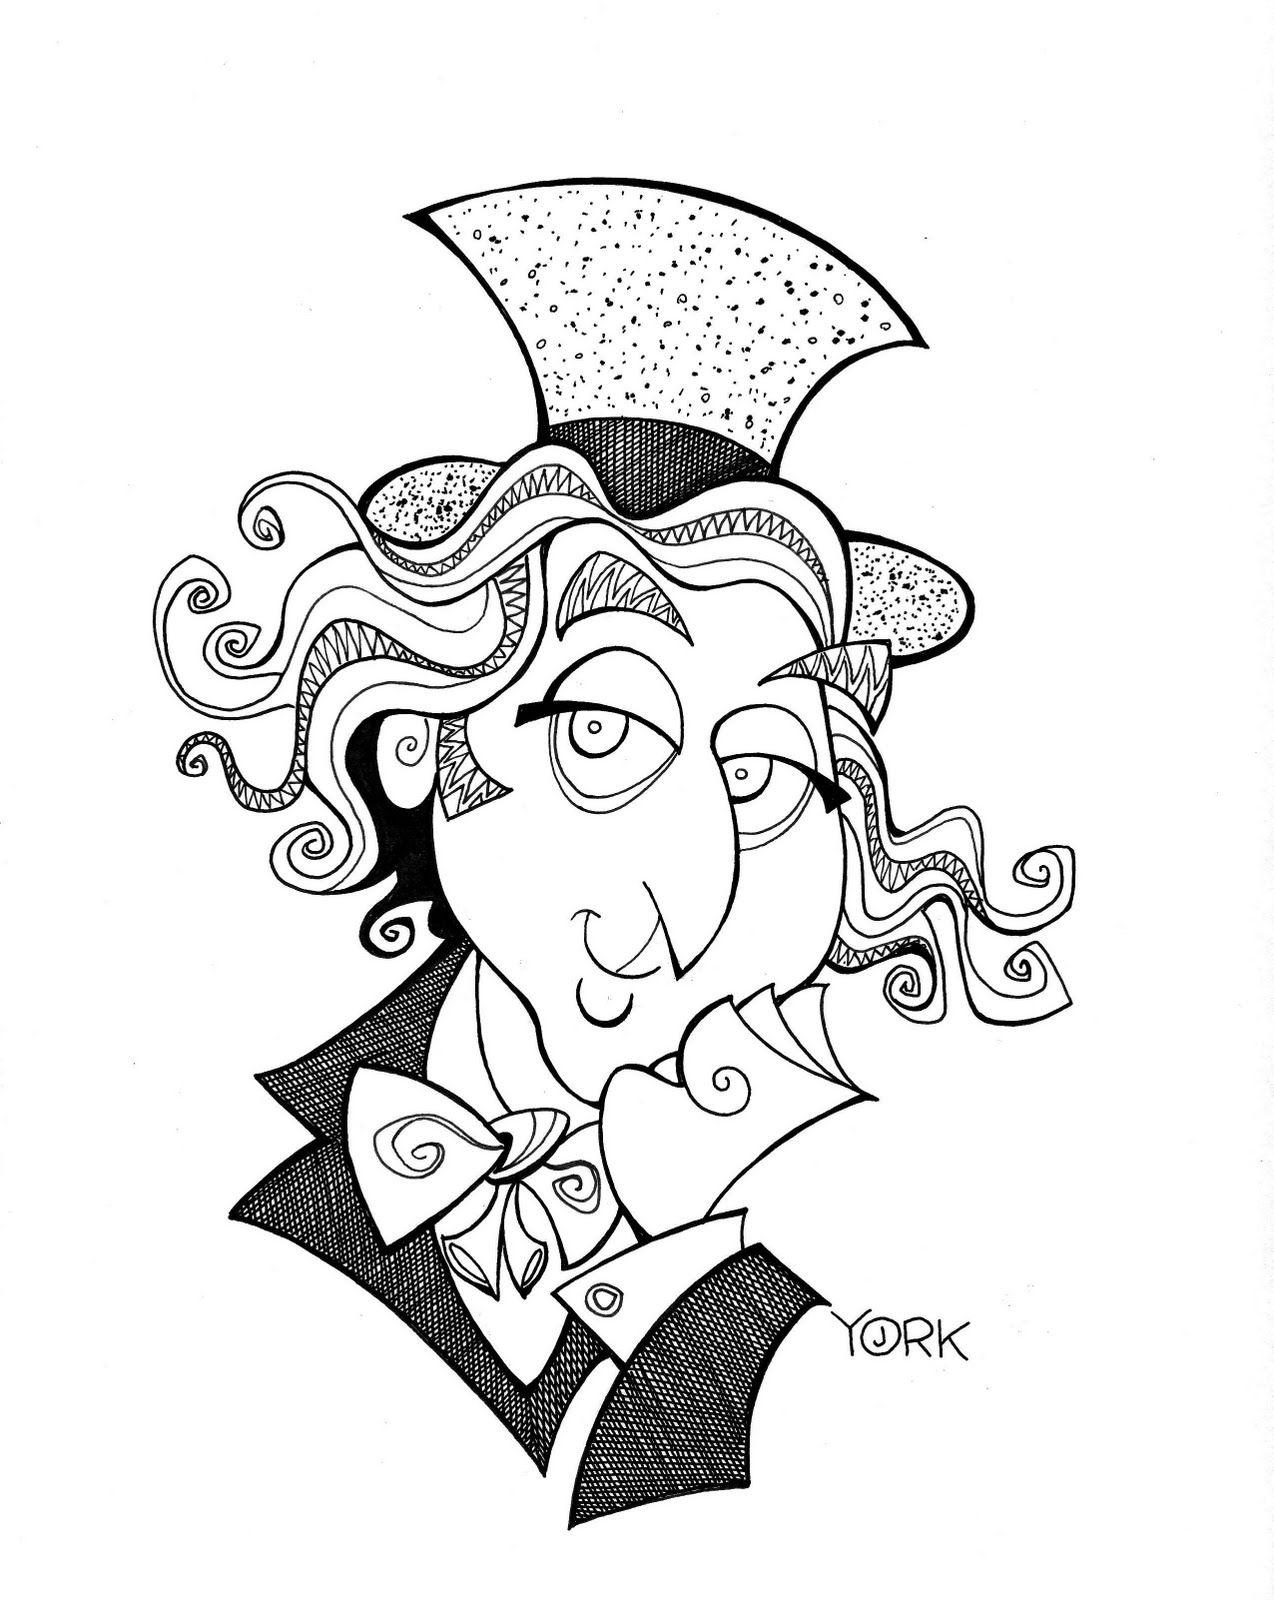 Original caricature of Gene Wilder as Willy Wonka by Jeff York ...